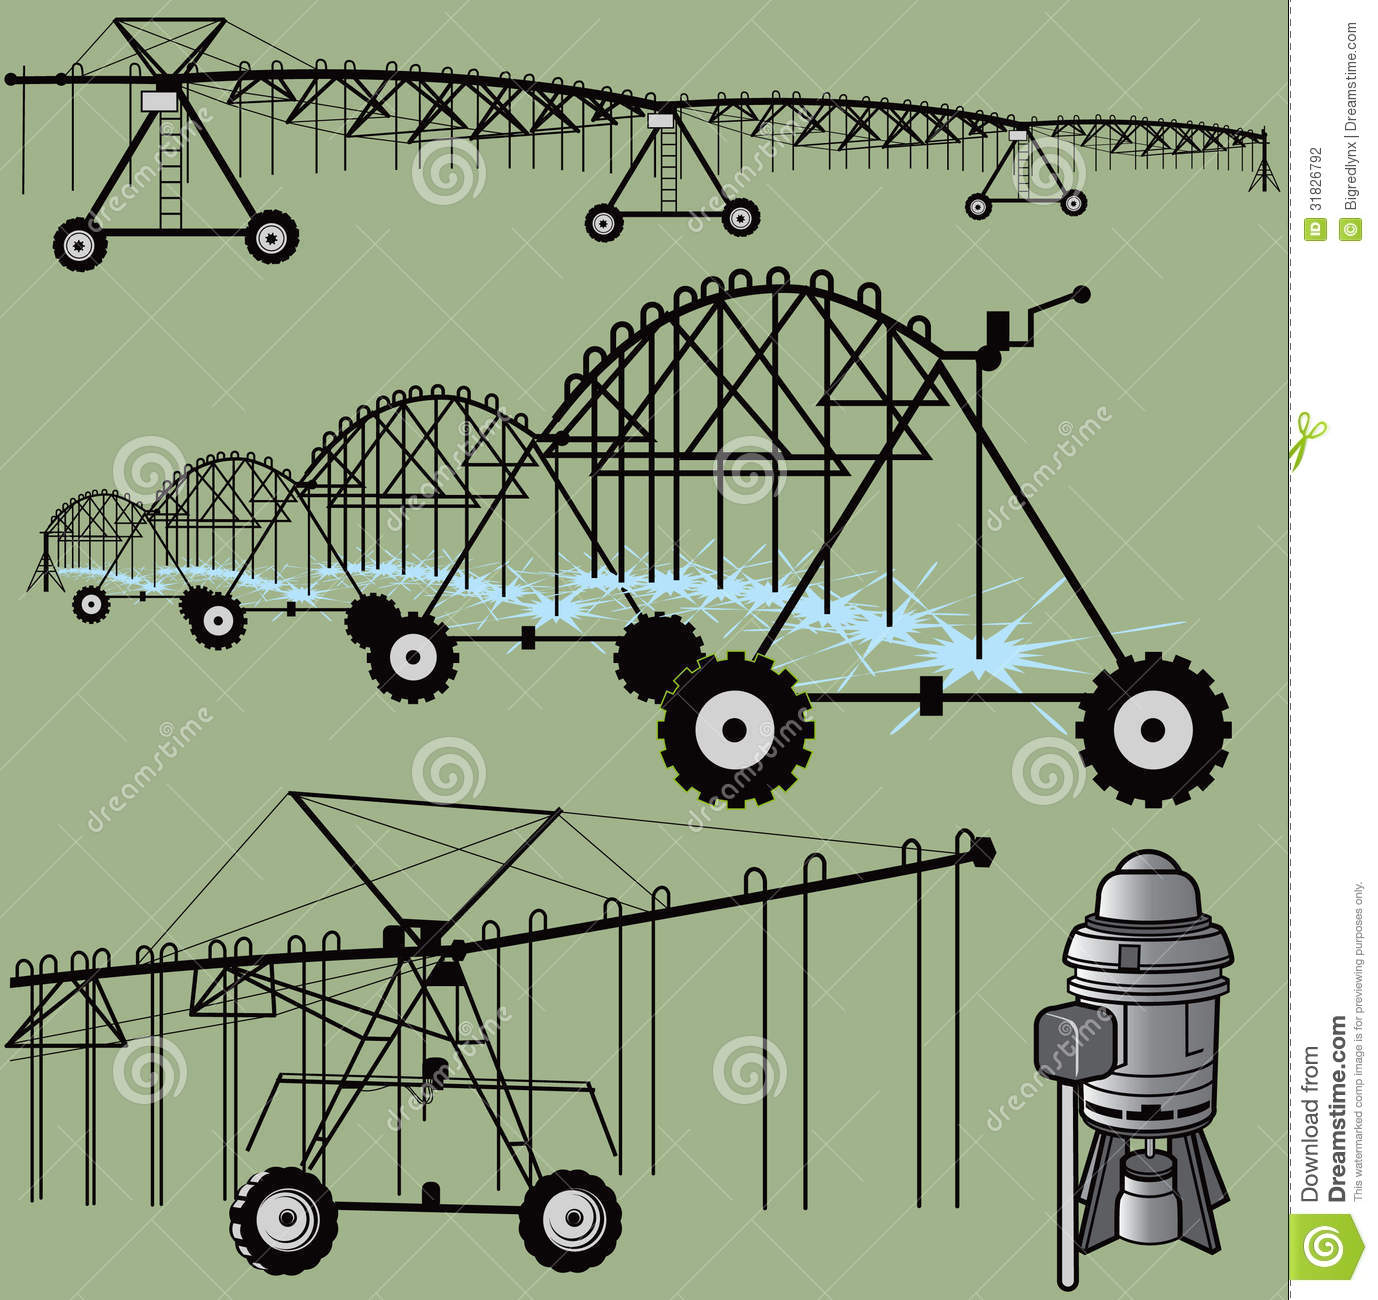 Irrigation Clip Art Stock Photography.